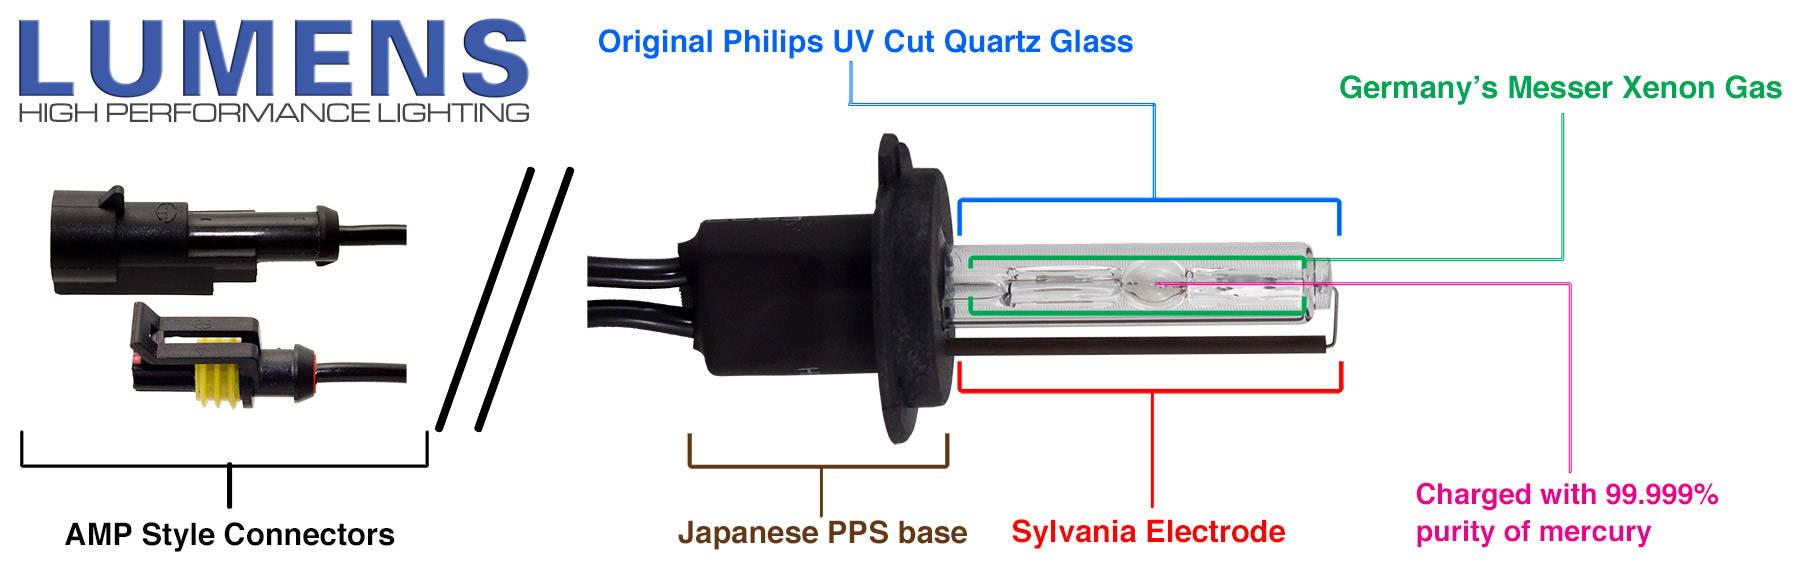 LUMENS HPL Xenon HID Bulb Standards